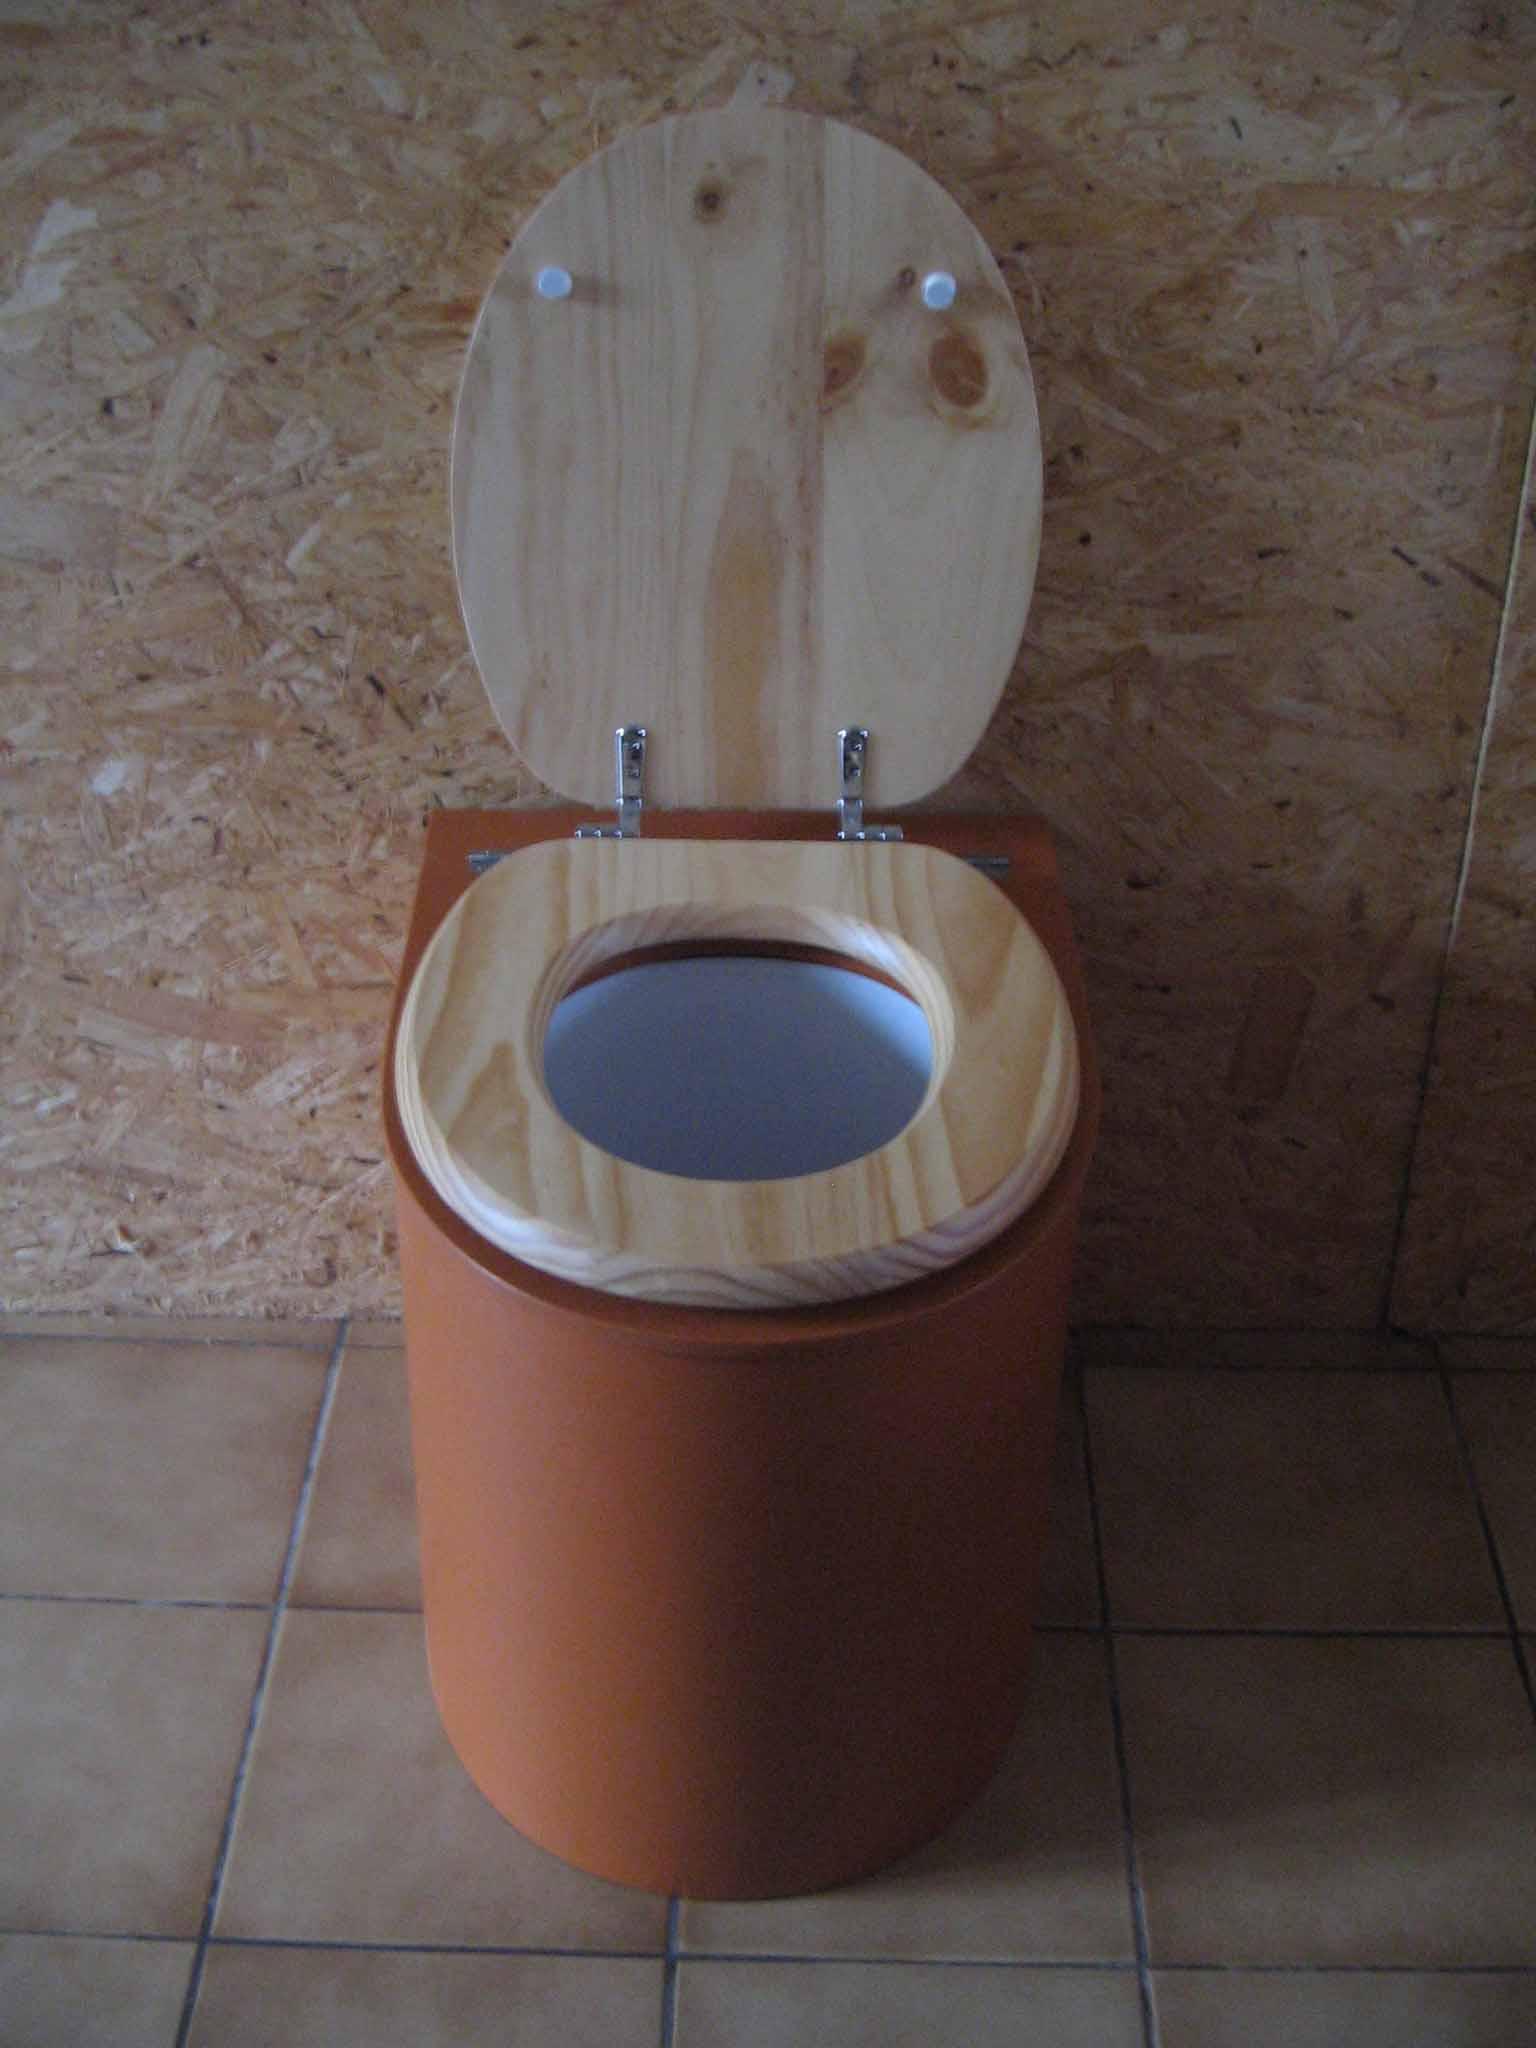 Toilette seche moderne  Fabulous Toilettes